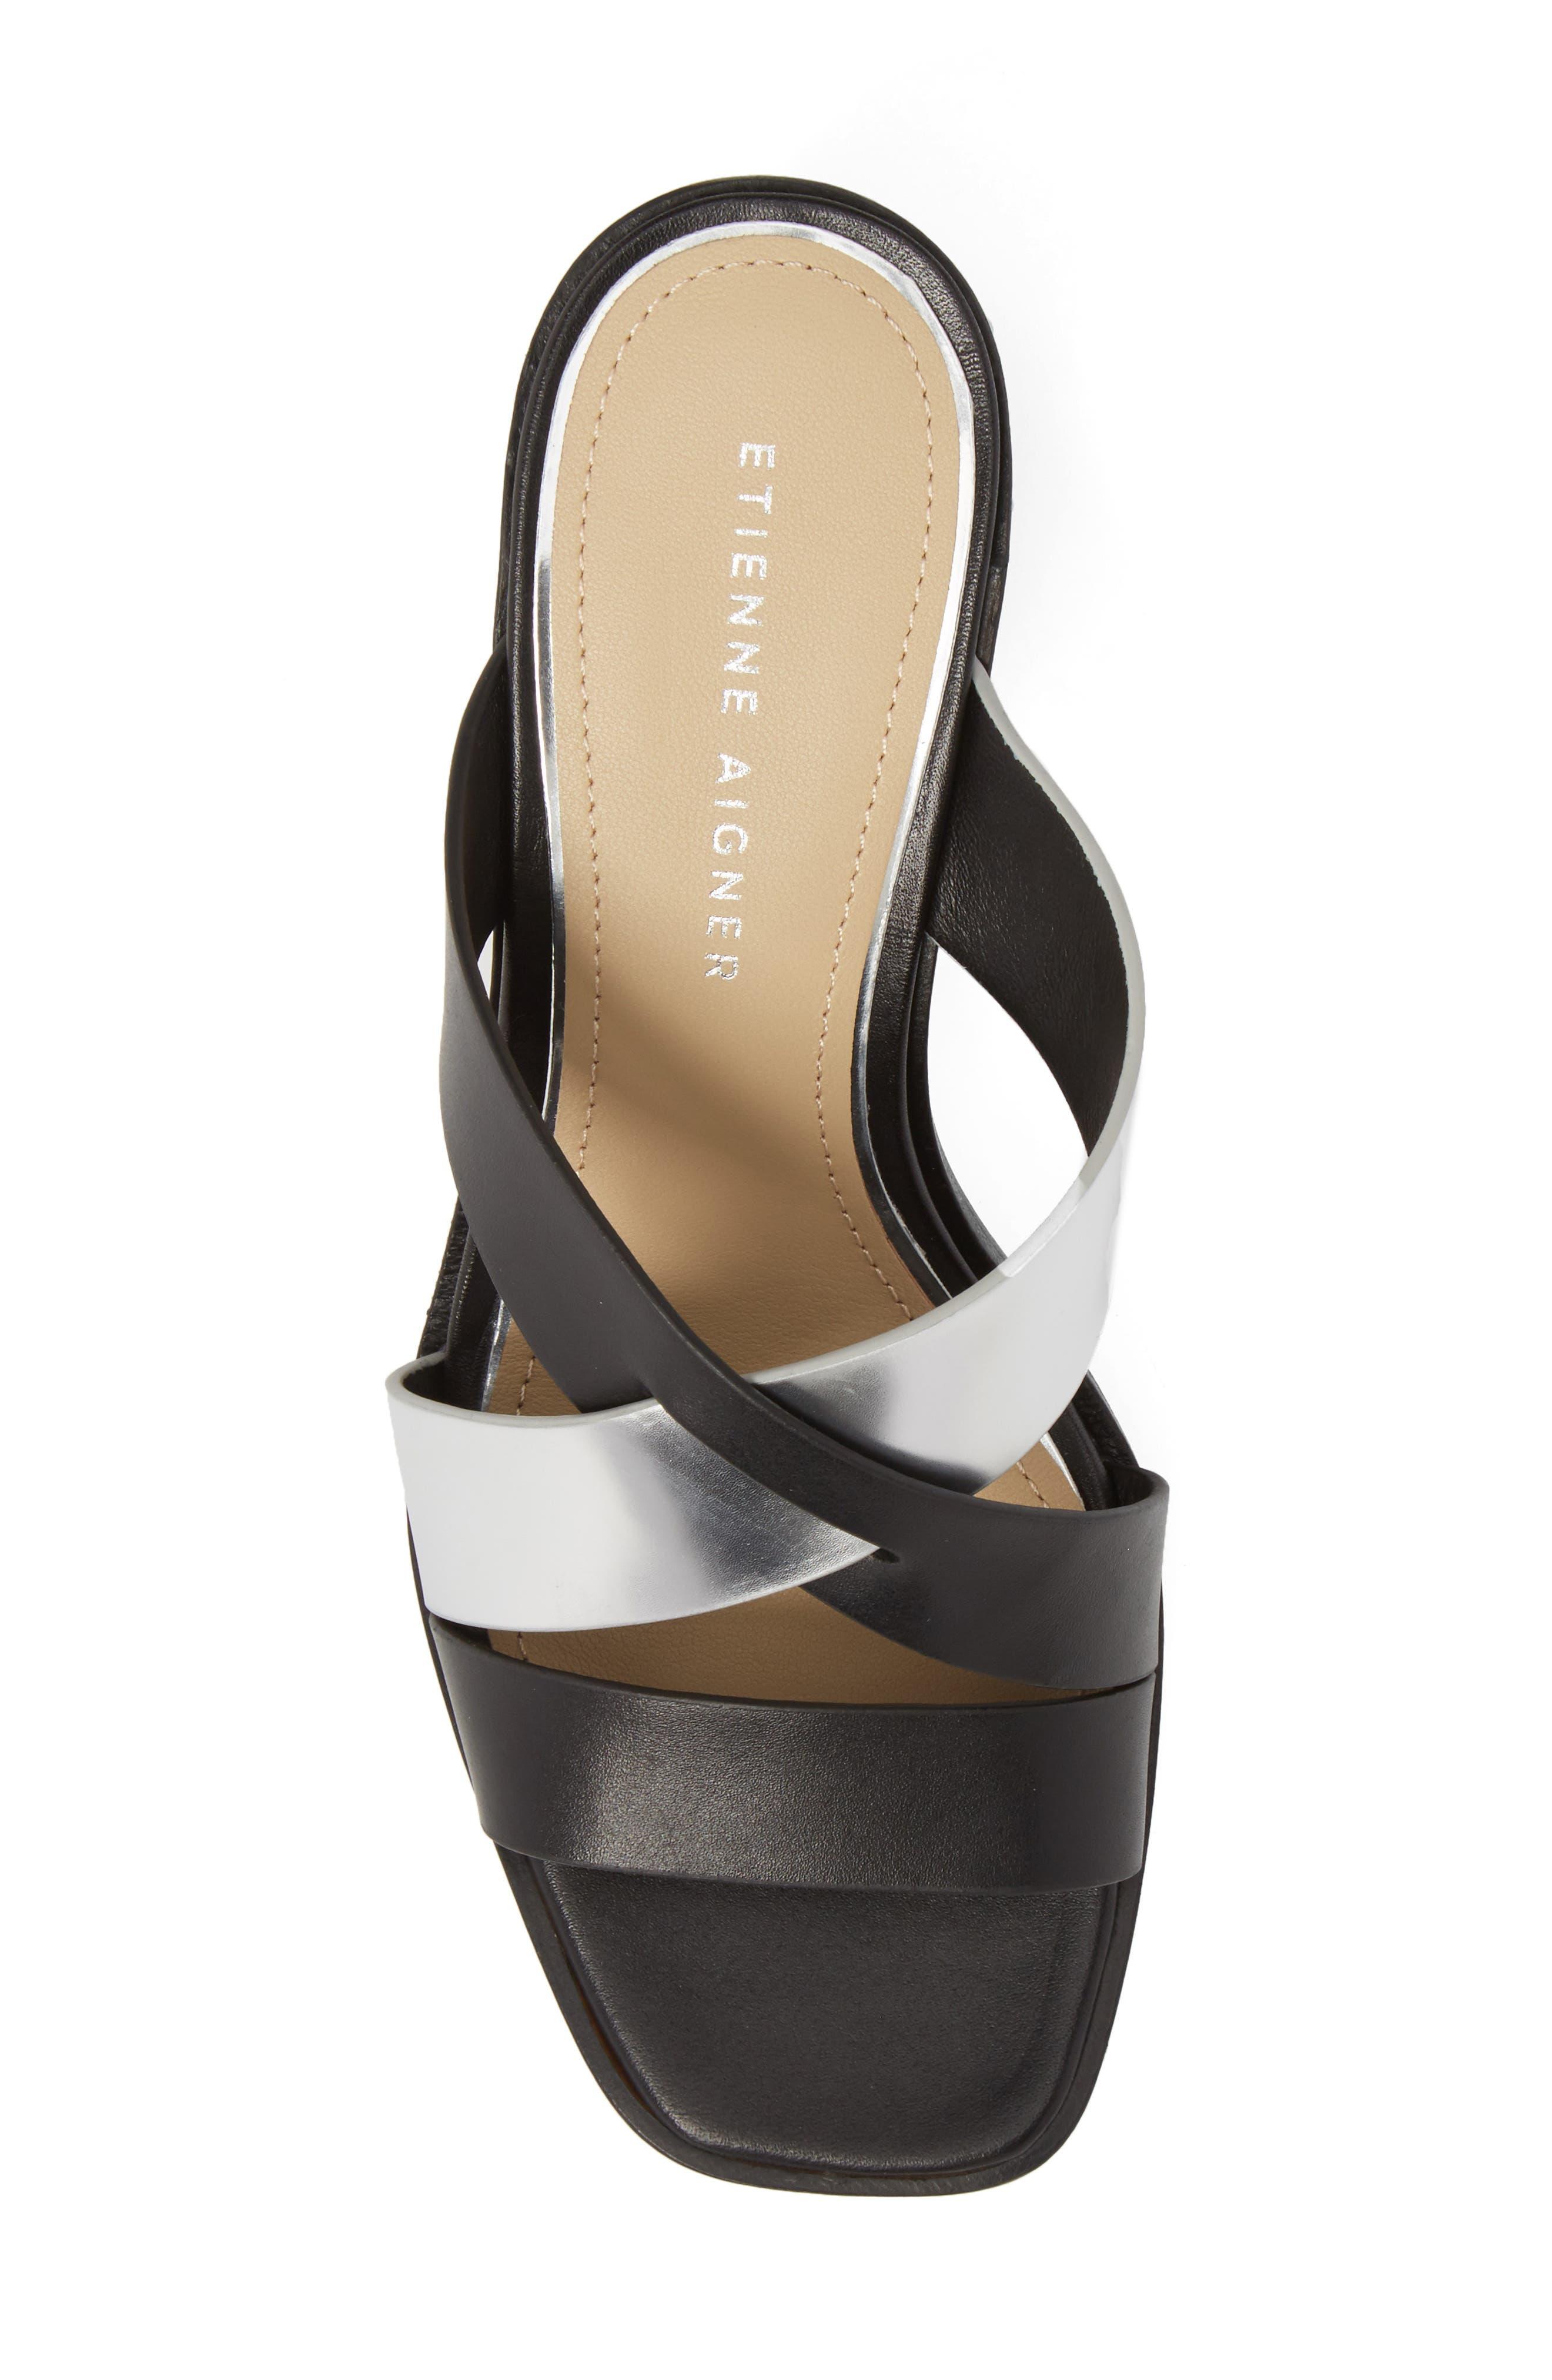 Negroni Cross Strap Mule Sandal,                             Alternate thumbnail 5, color,                             BLACK/ SILVER LEATHER